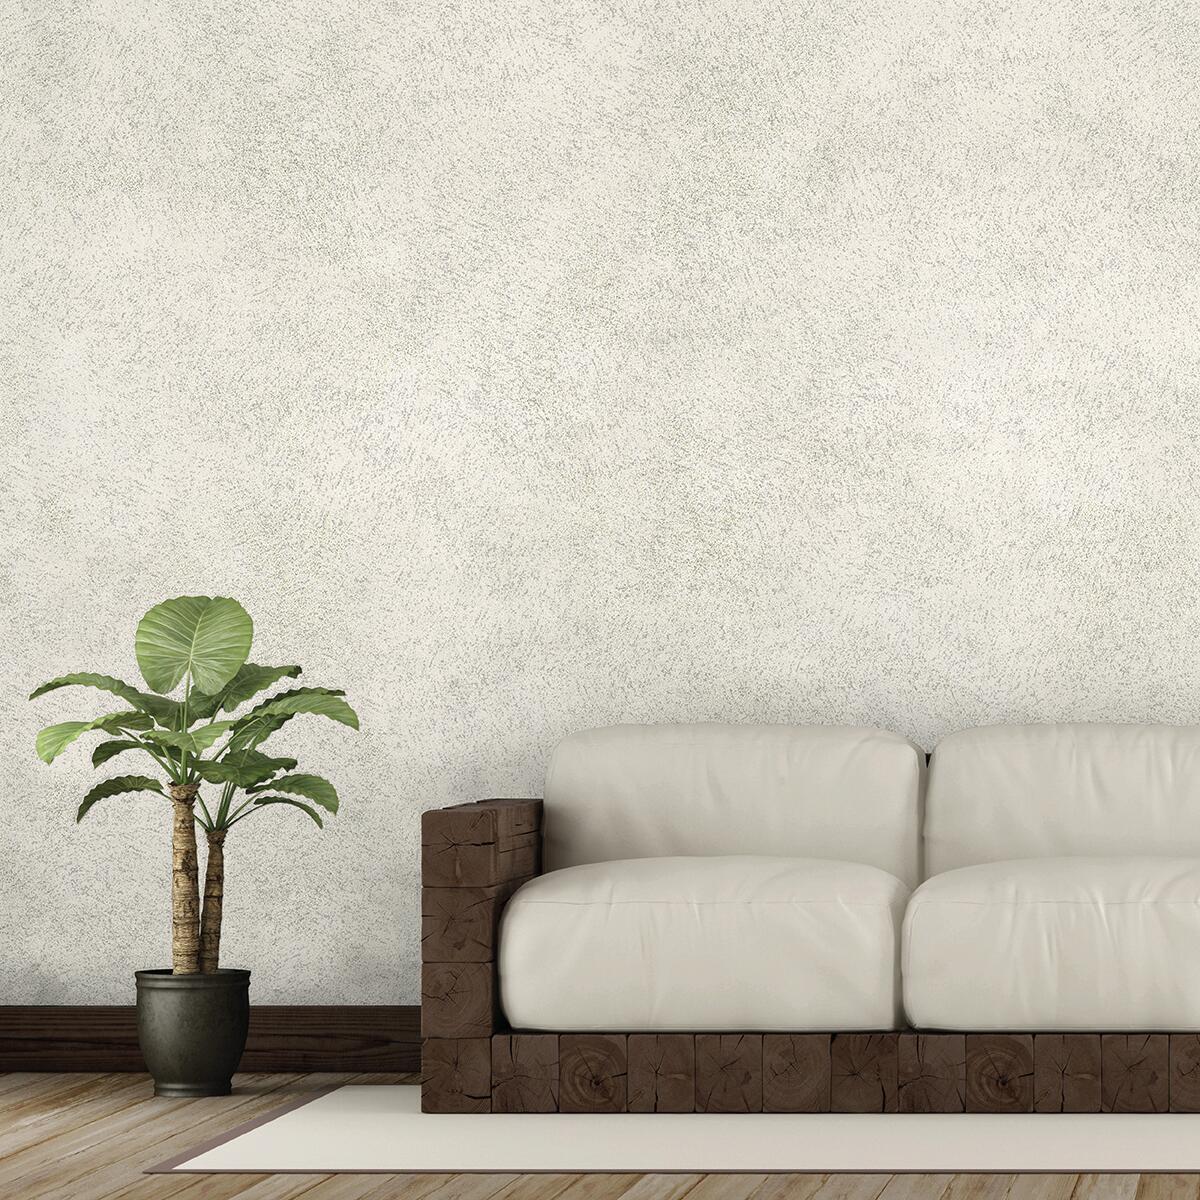 Pittura decorativa GECKOS Sabbia 4 l bianco argento sabbiato - 1